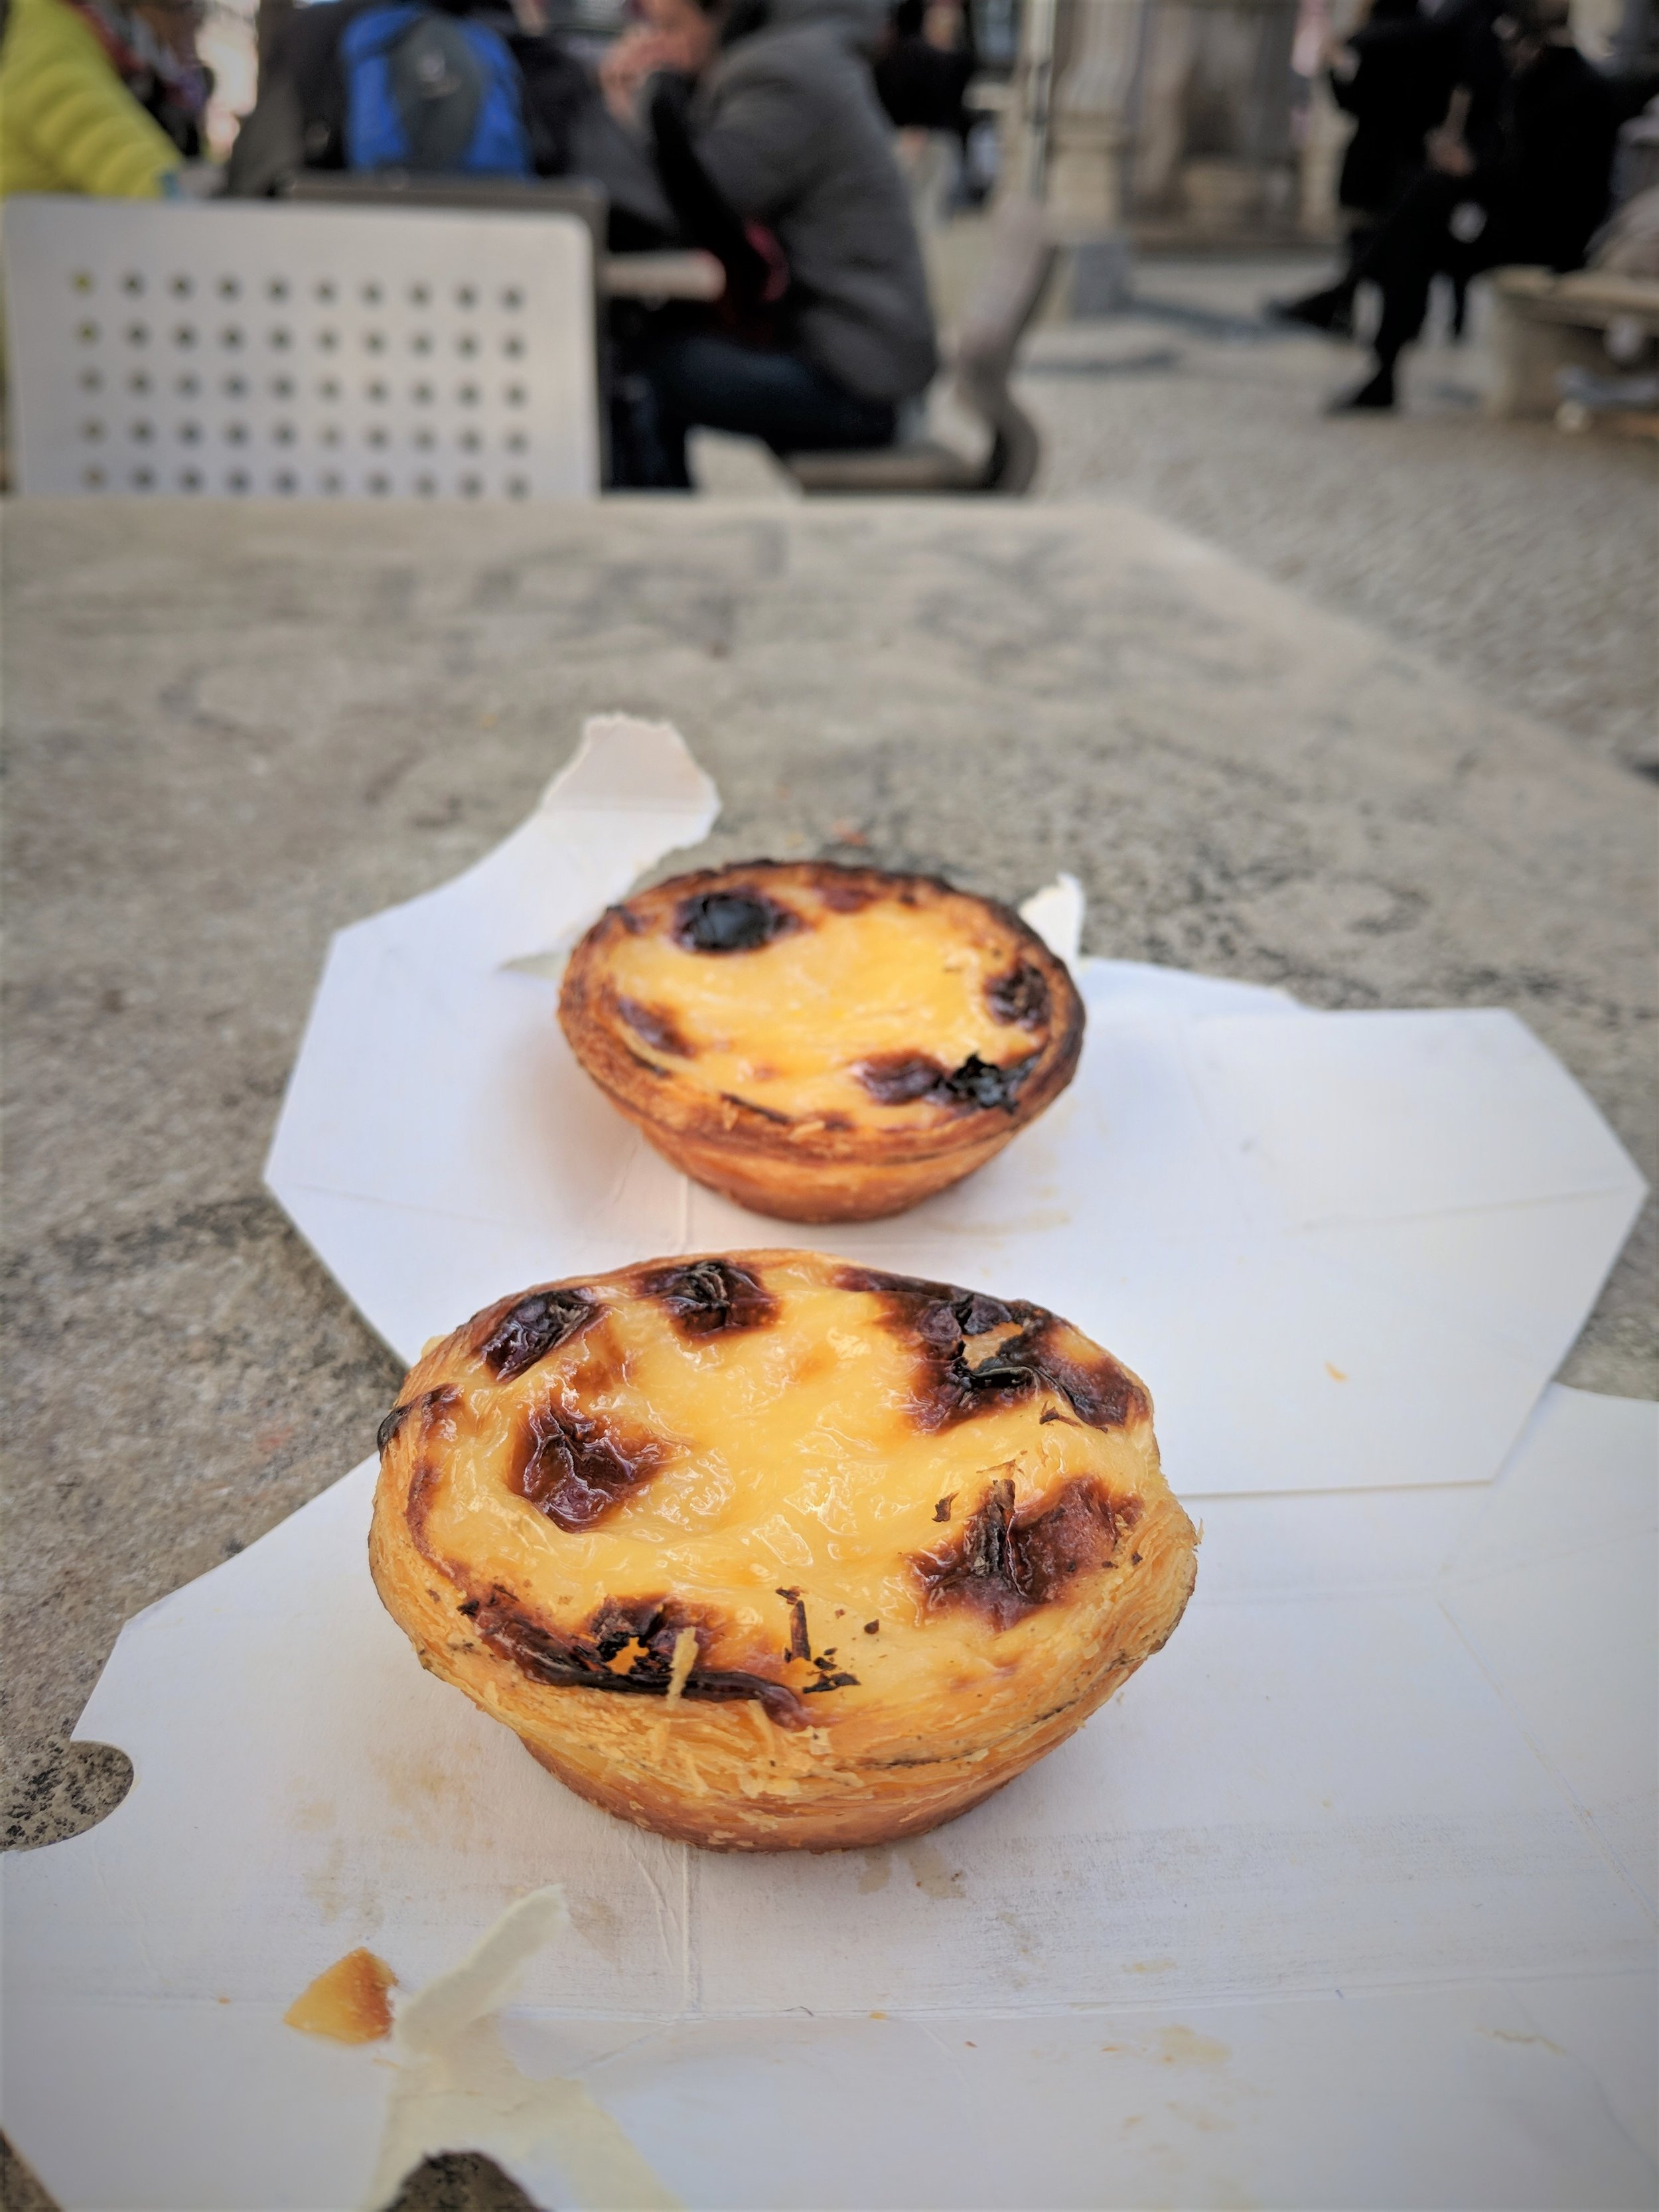 Pastel de nata - Portuguese custard tarts